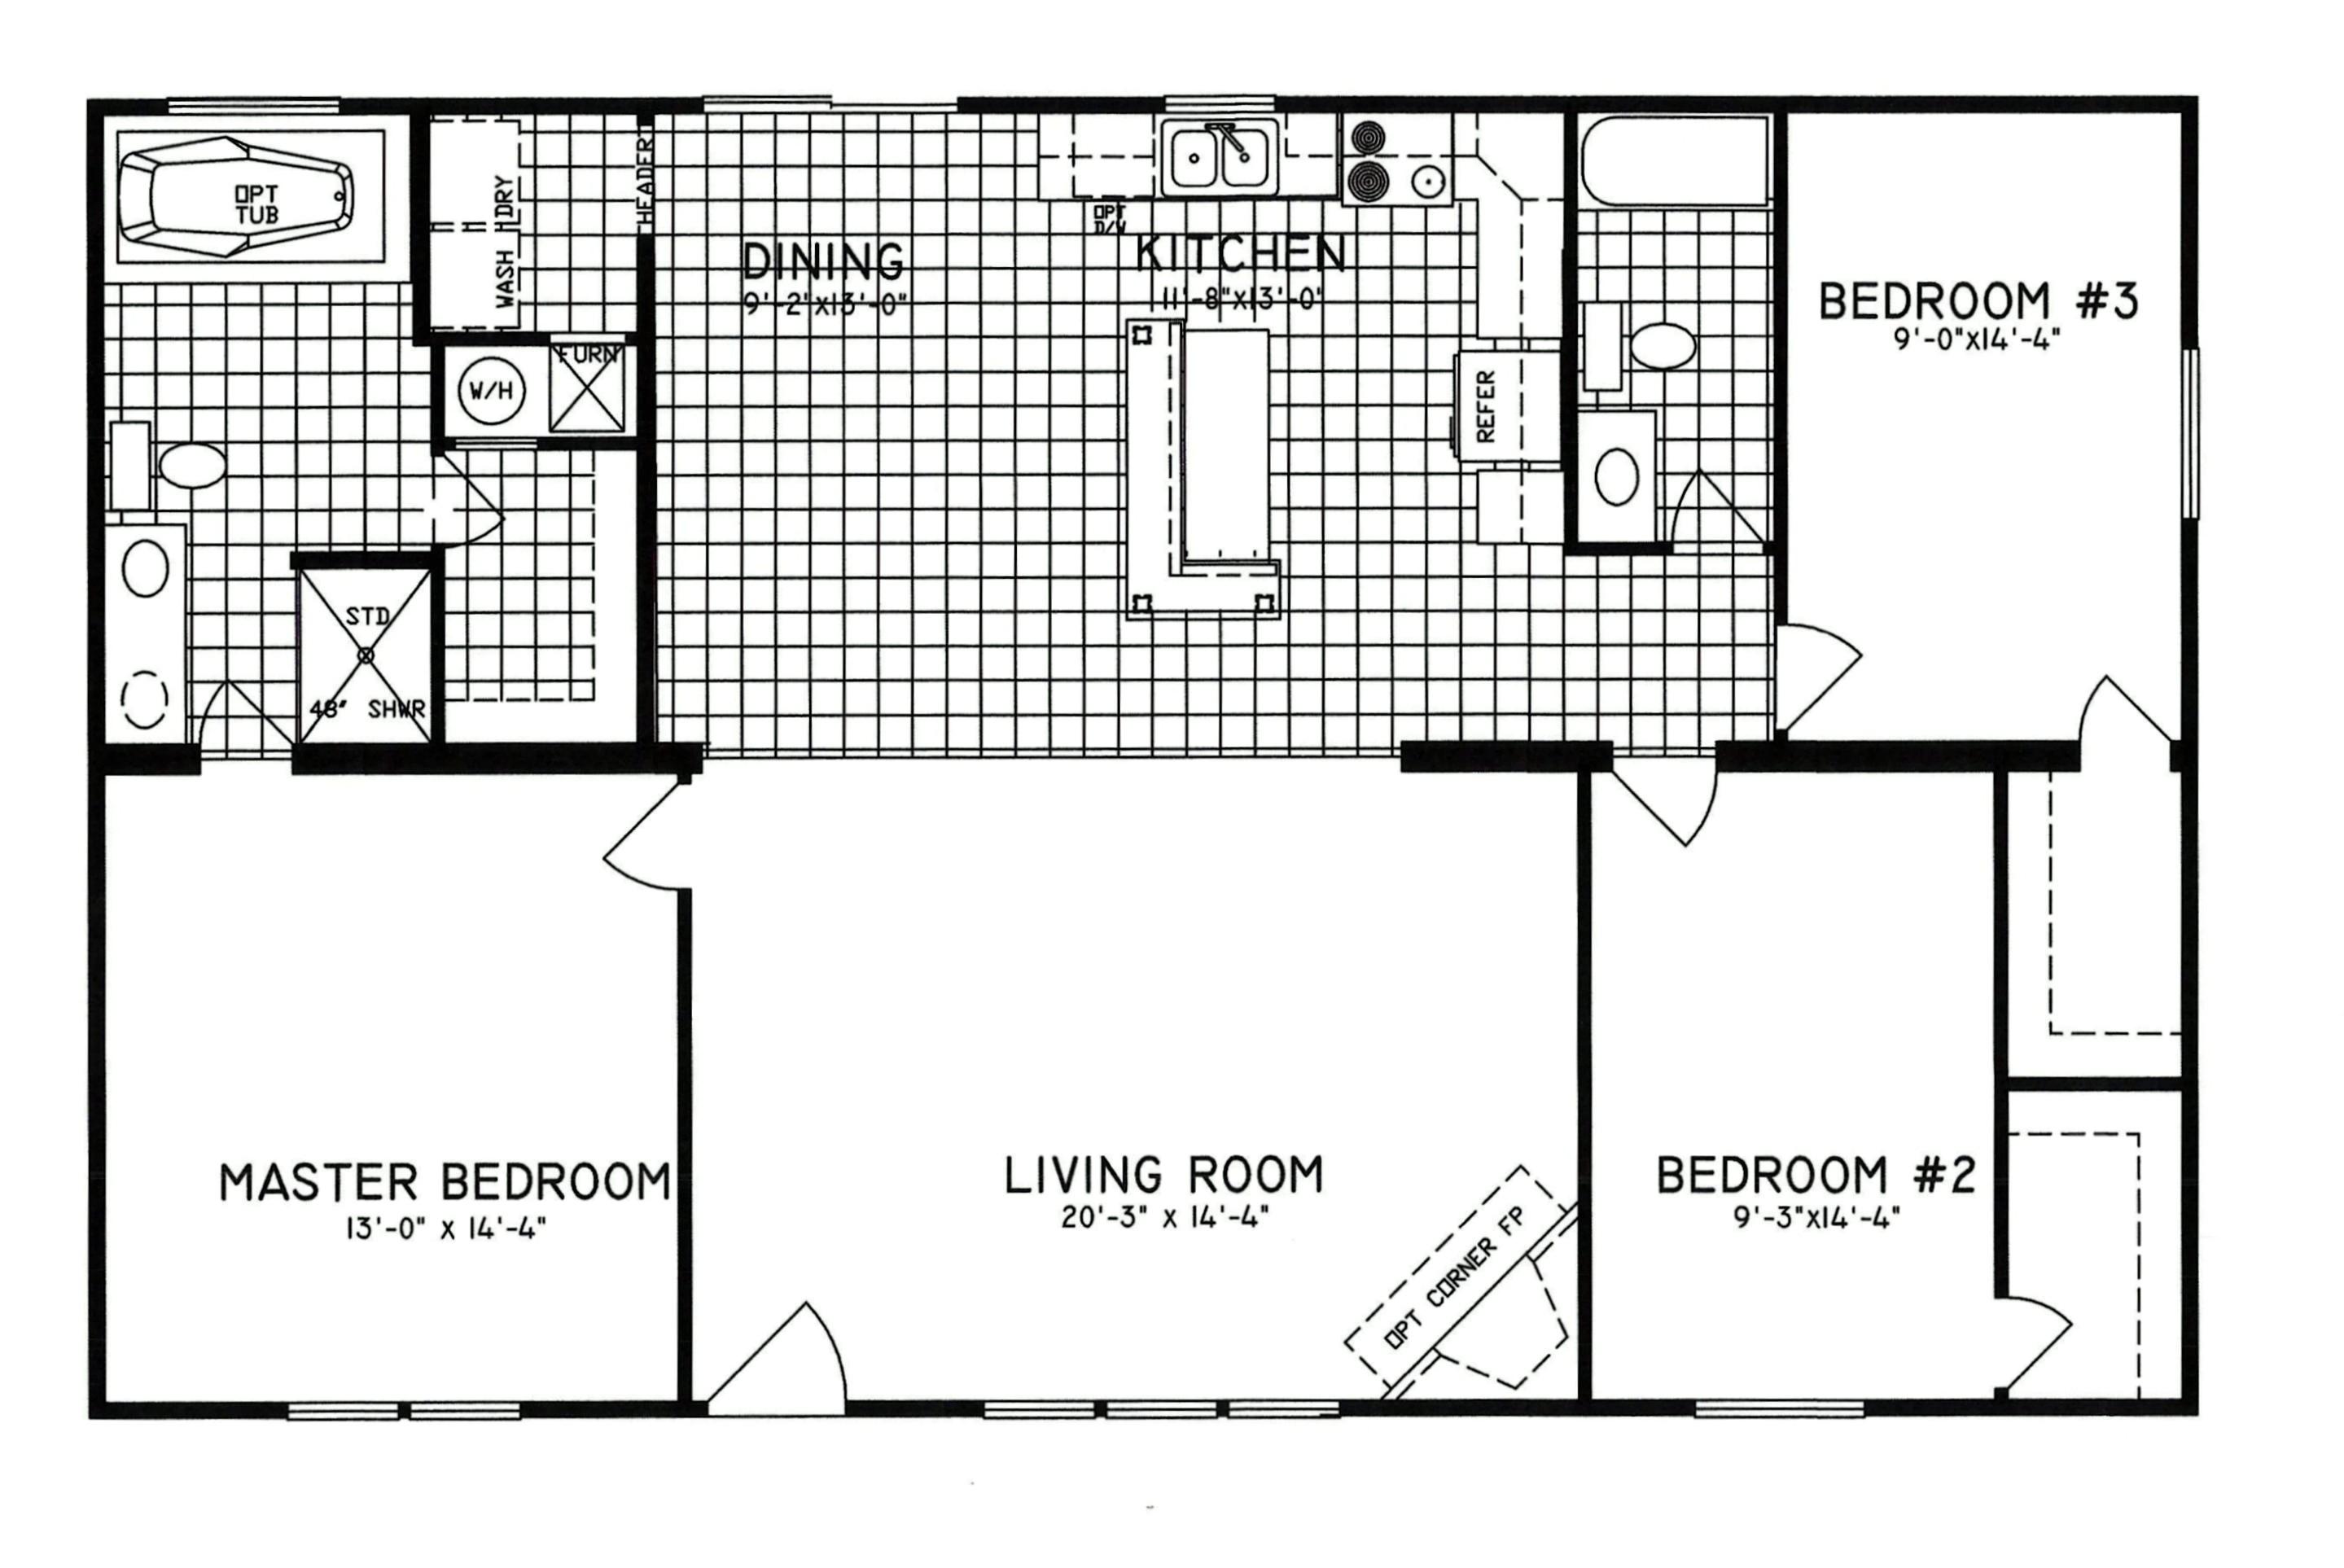 1999 redman mobile home floor plans